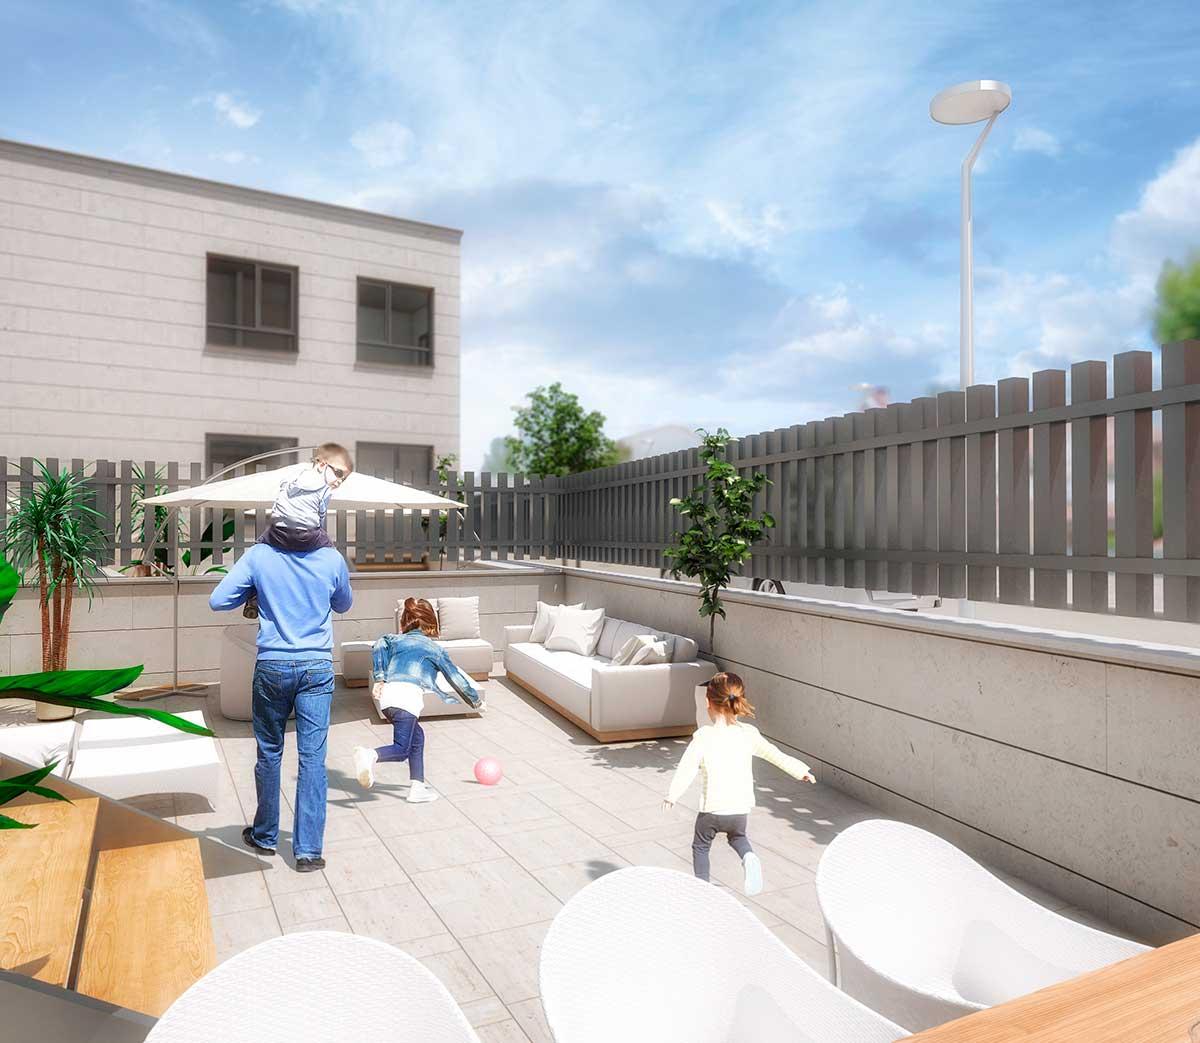 patio jardín terraza vivienda 3